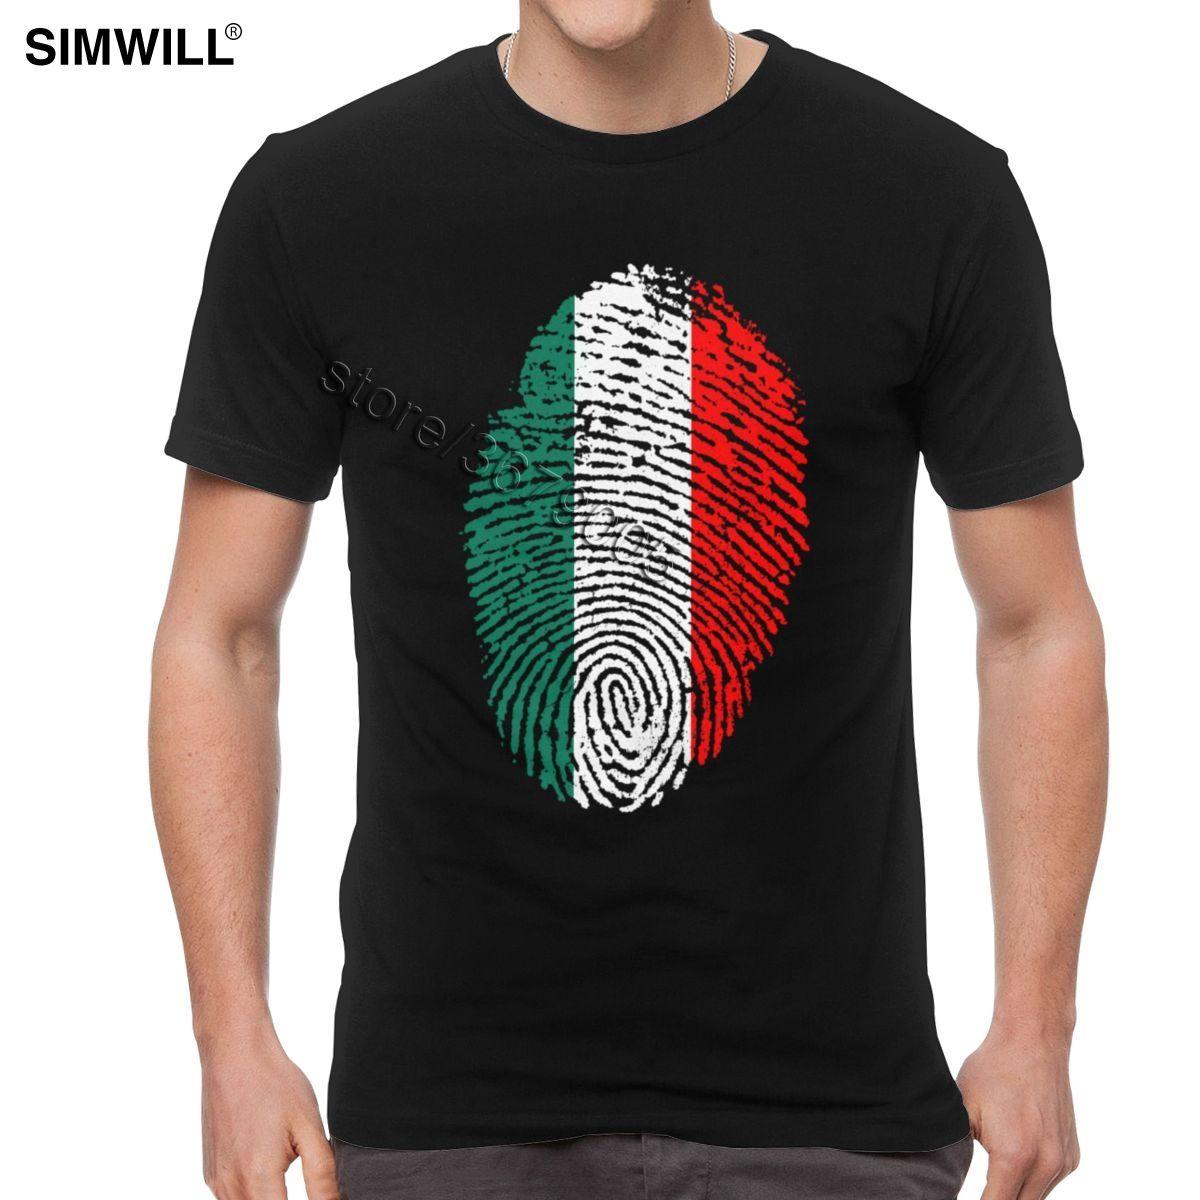 Марка Italia Fingerprint Tee рубашки для мужчин Печатных 100% хлопок футболки O шеи коротким рукавом Retro National Pride T-Shirt